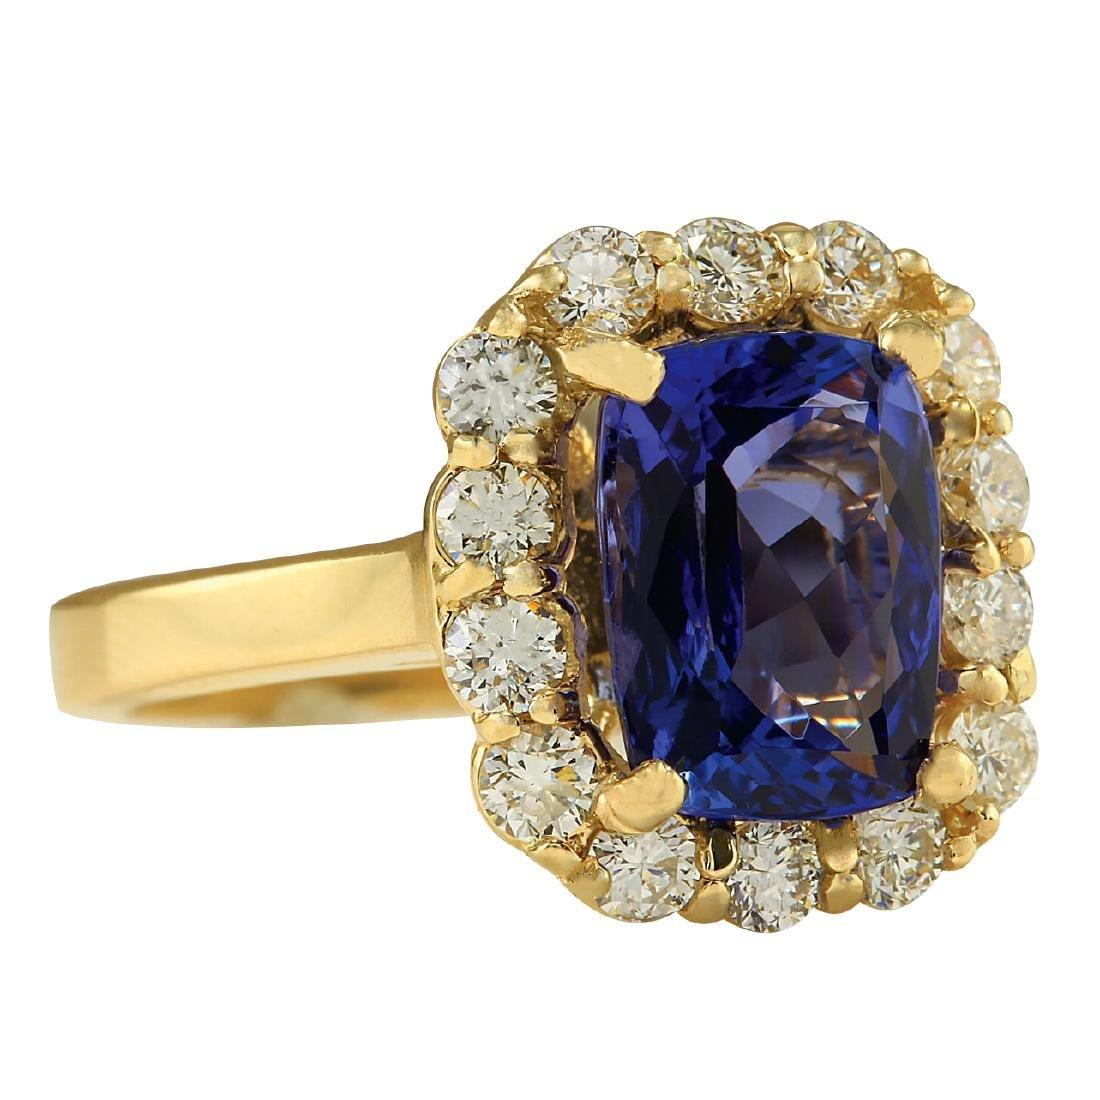 4.15CTW Natural Tanzanite And Diamond Ring In 18K - 2